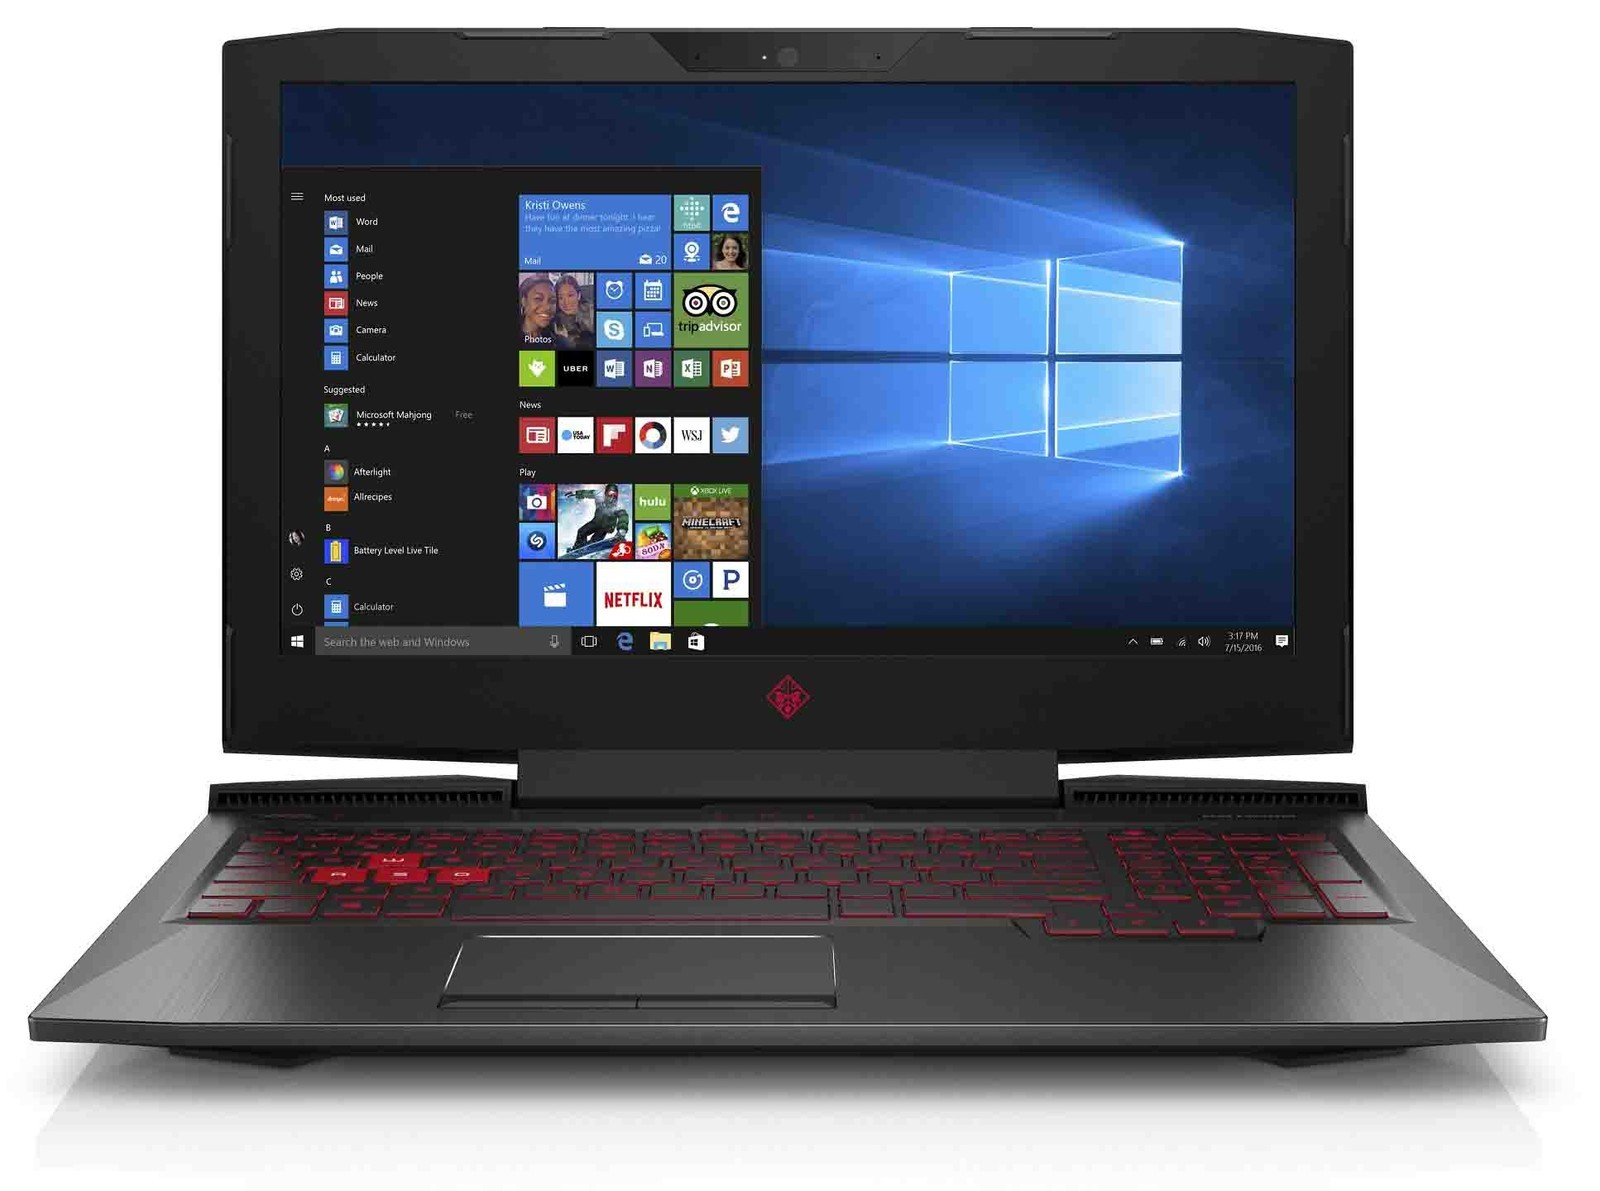 NVIDIA GeForce GTX 1060 (Max-Q) vs GTX 1060 (Laptop) – performance